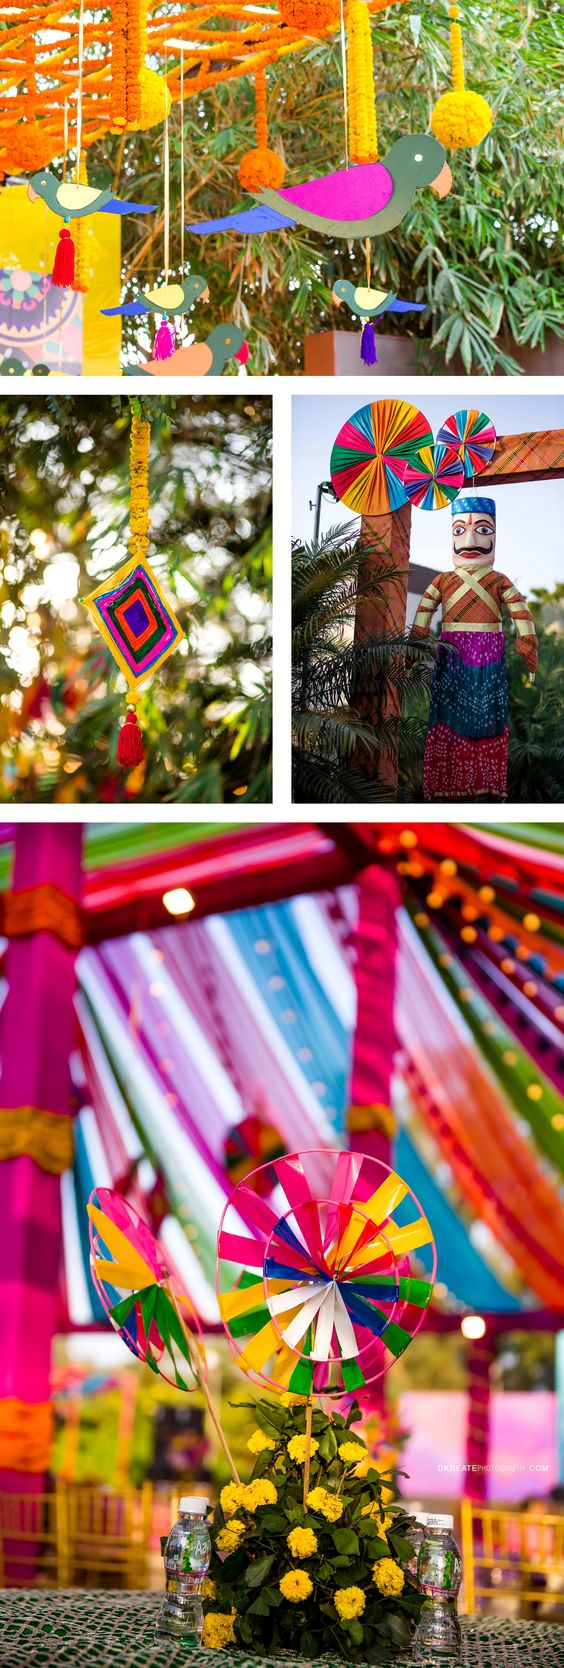 Decoration ideas for Lohri Beautiful Craft ideas for Lohri Festival